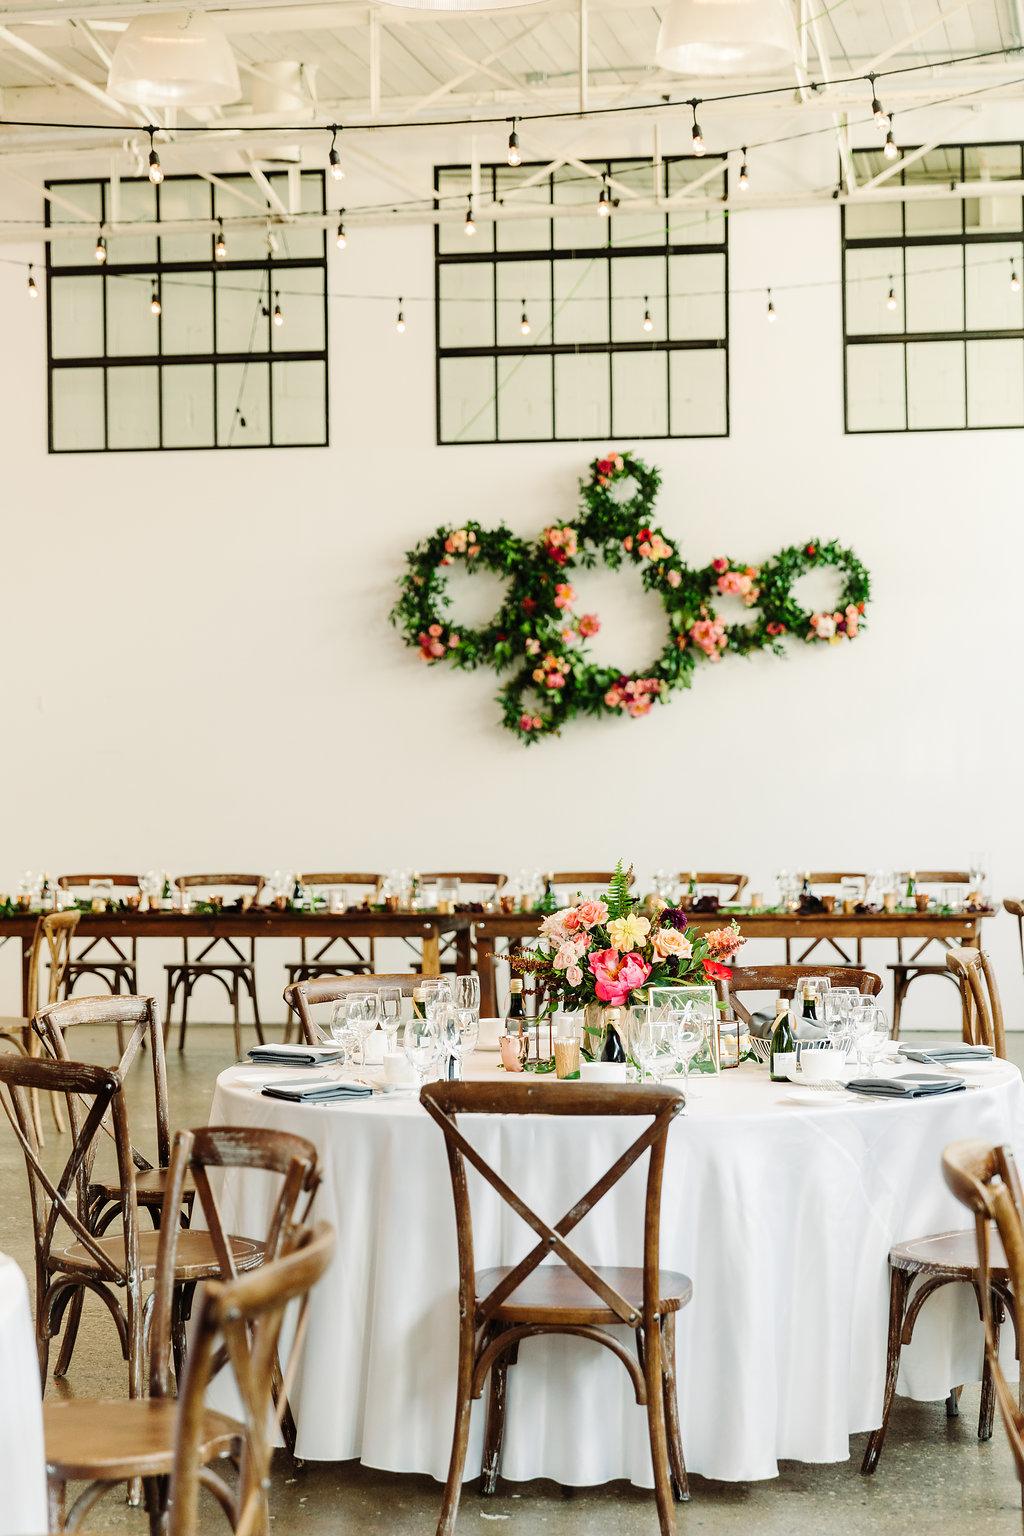 Airship_37_toronto_wedding_photography_magnolia_studios-676.jpg